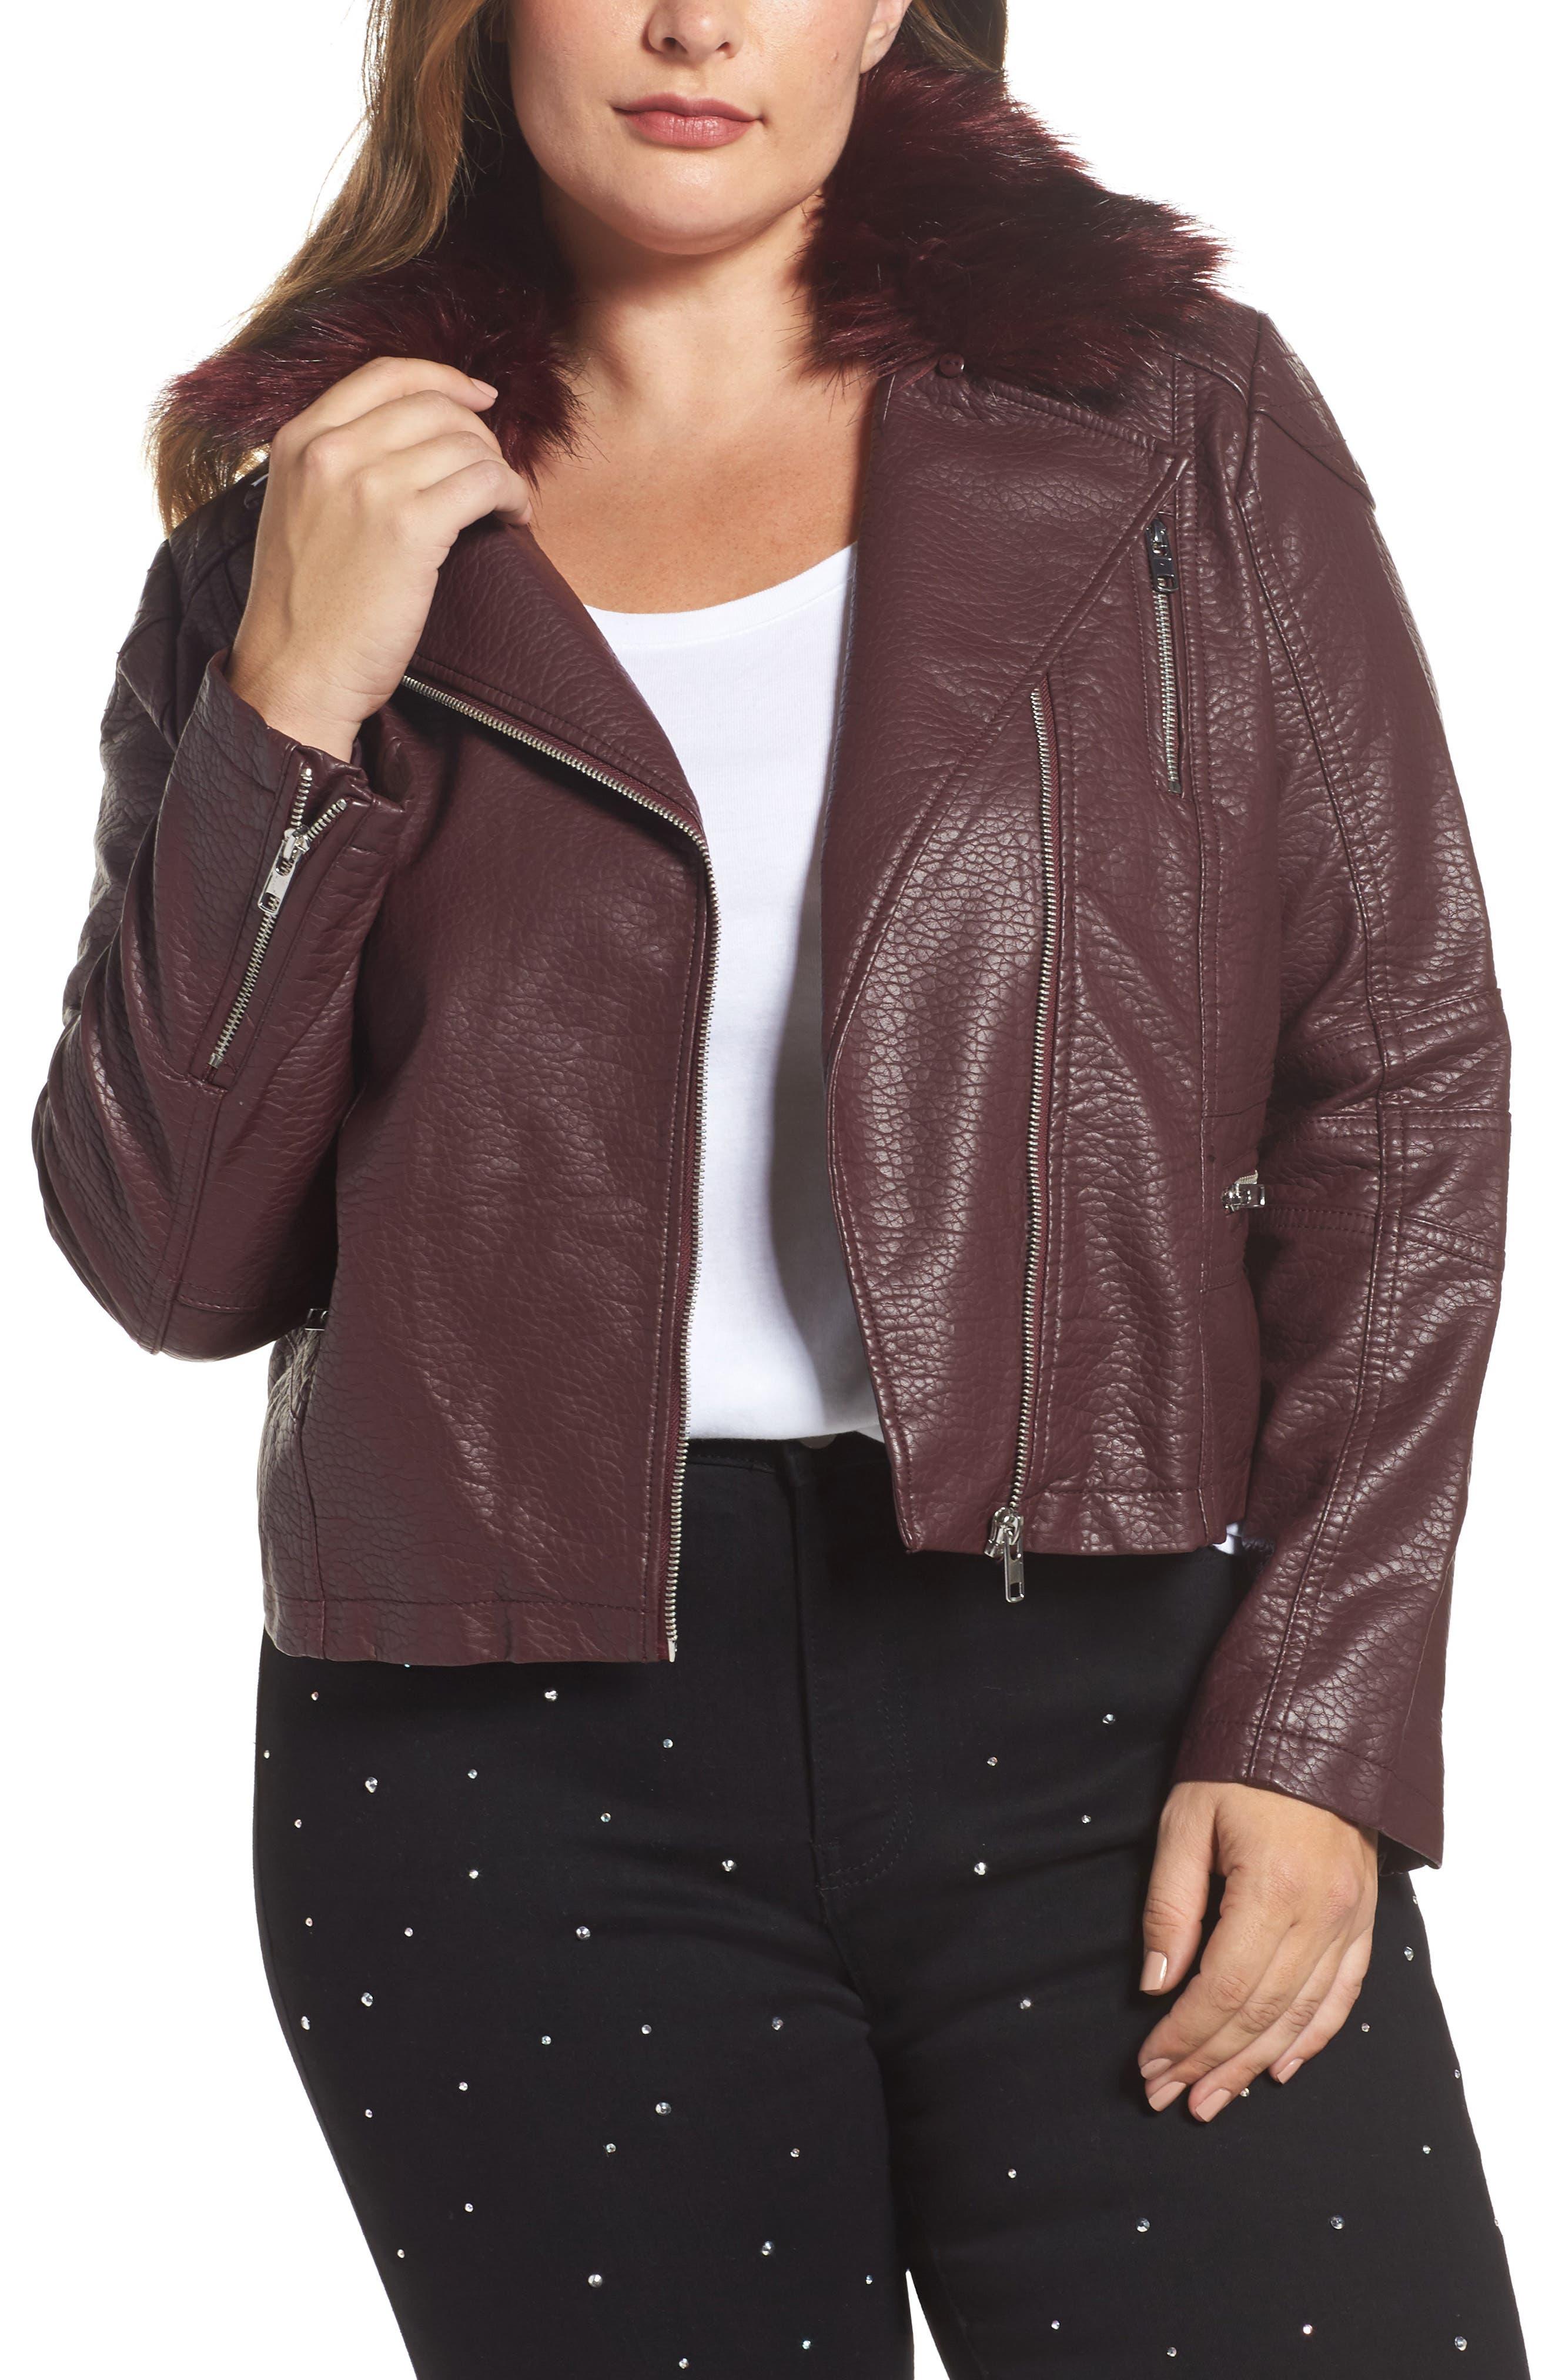 Alternate Image 1 Selected - LOST INK Faux Fur Trim Moto Jacket (Plus Size)